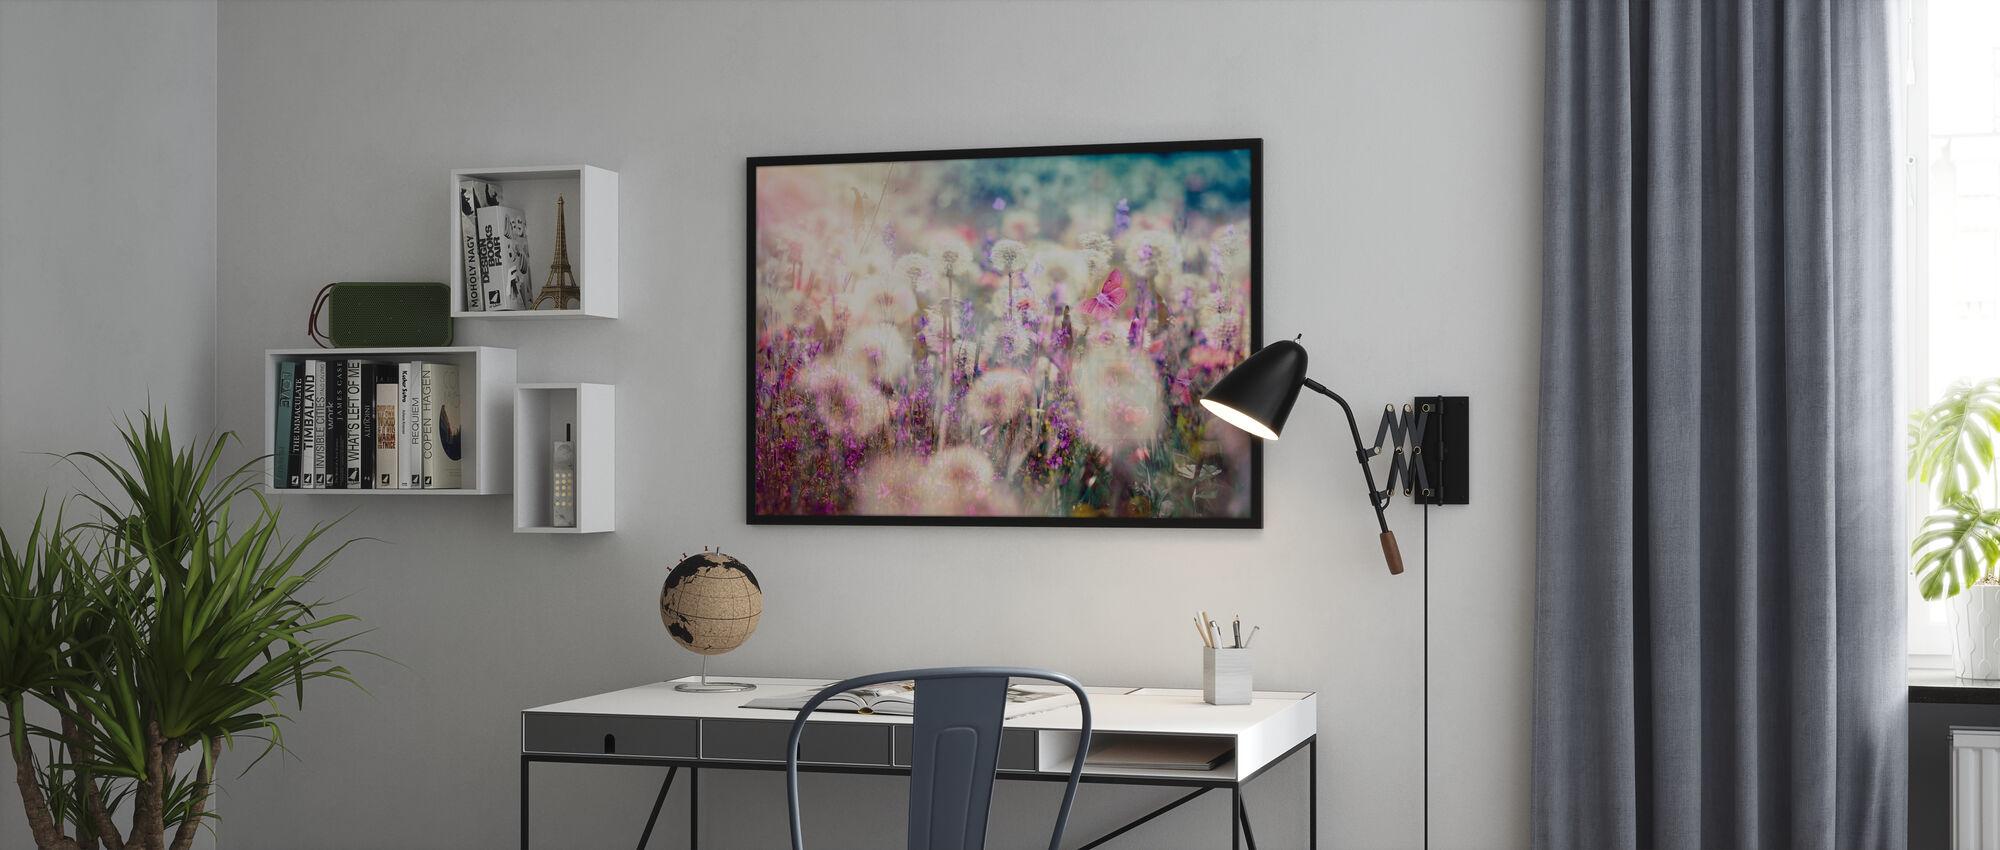 Spring - Dandelion Seed - Poster - Office